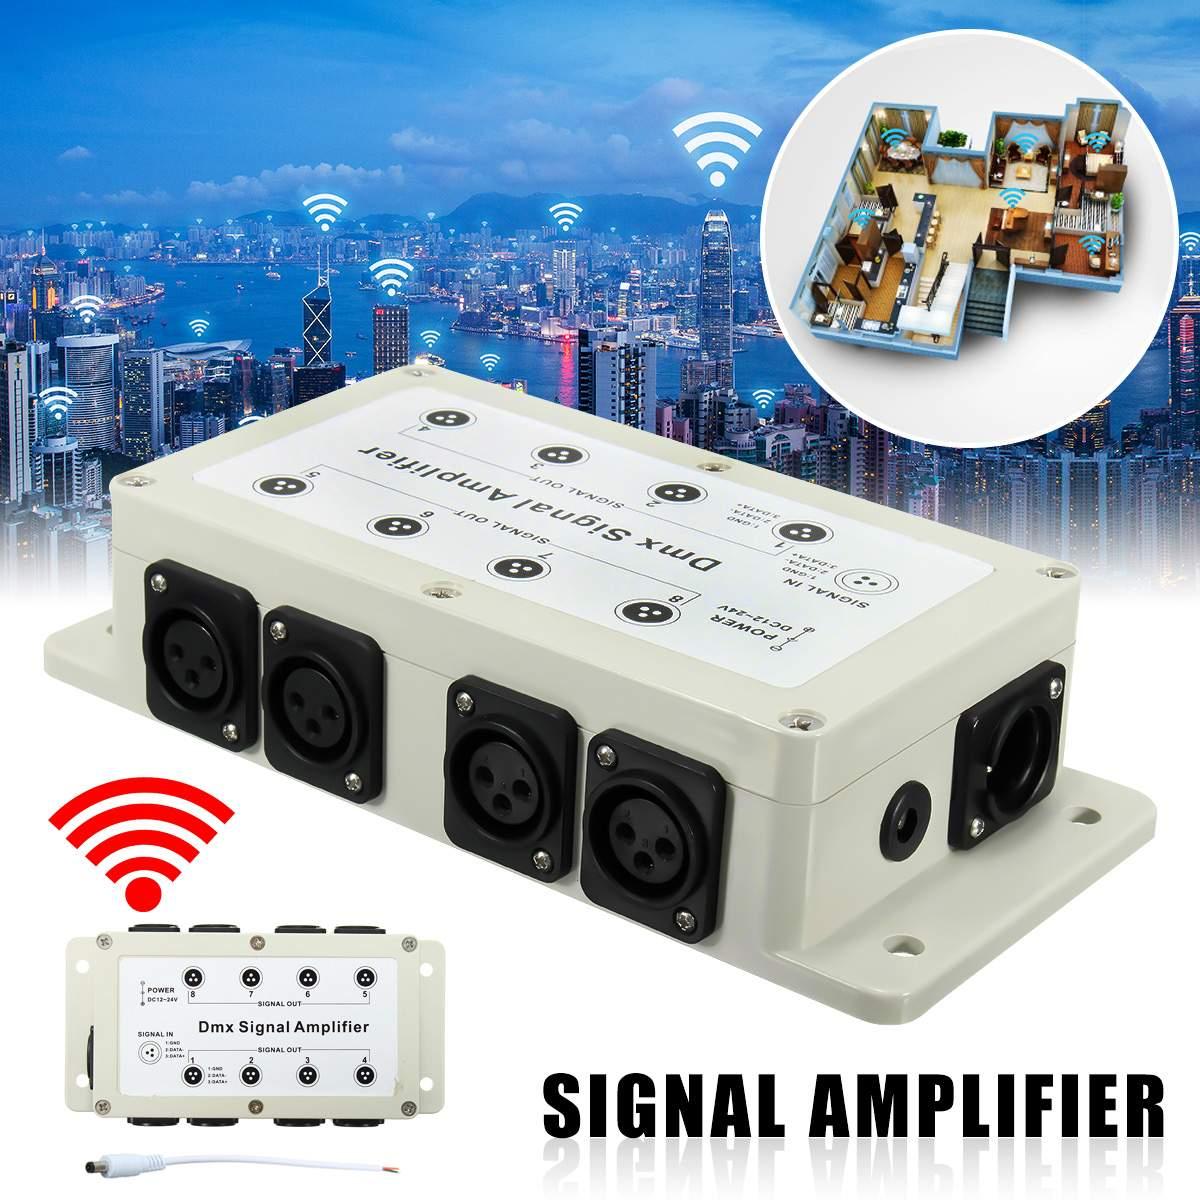 DC12-24V 8 Channel Output DMX DMX512 LED Controller Signal Amplifier Splitter Distributor For Home Equipments